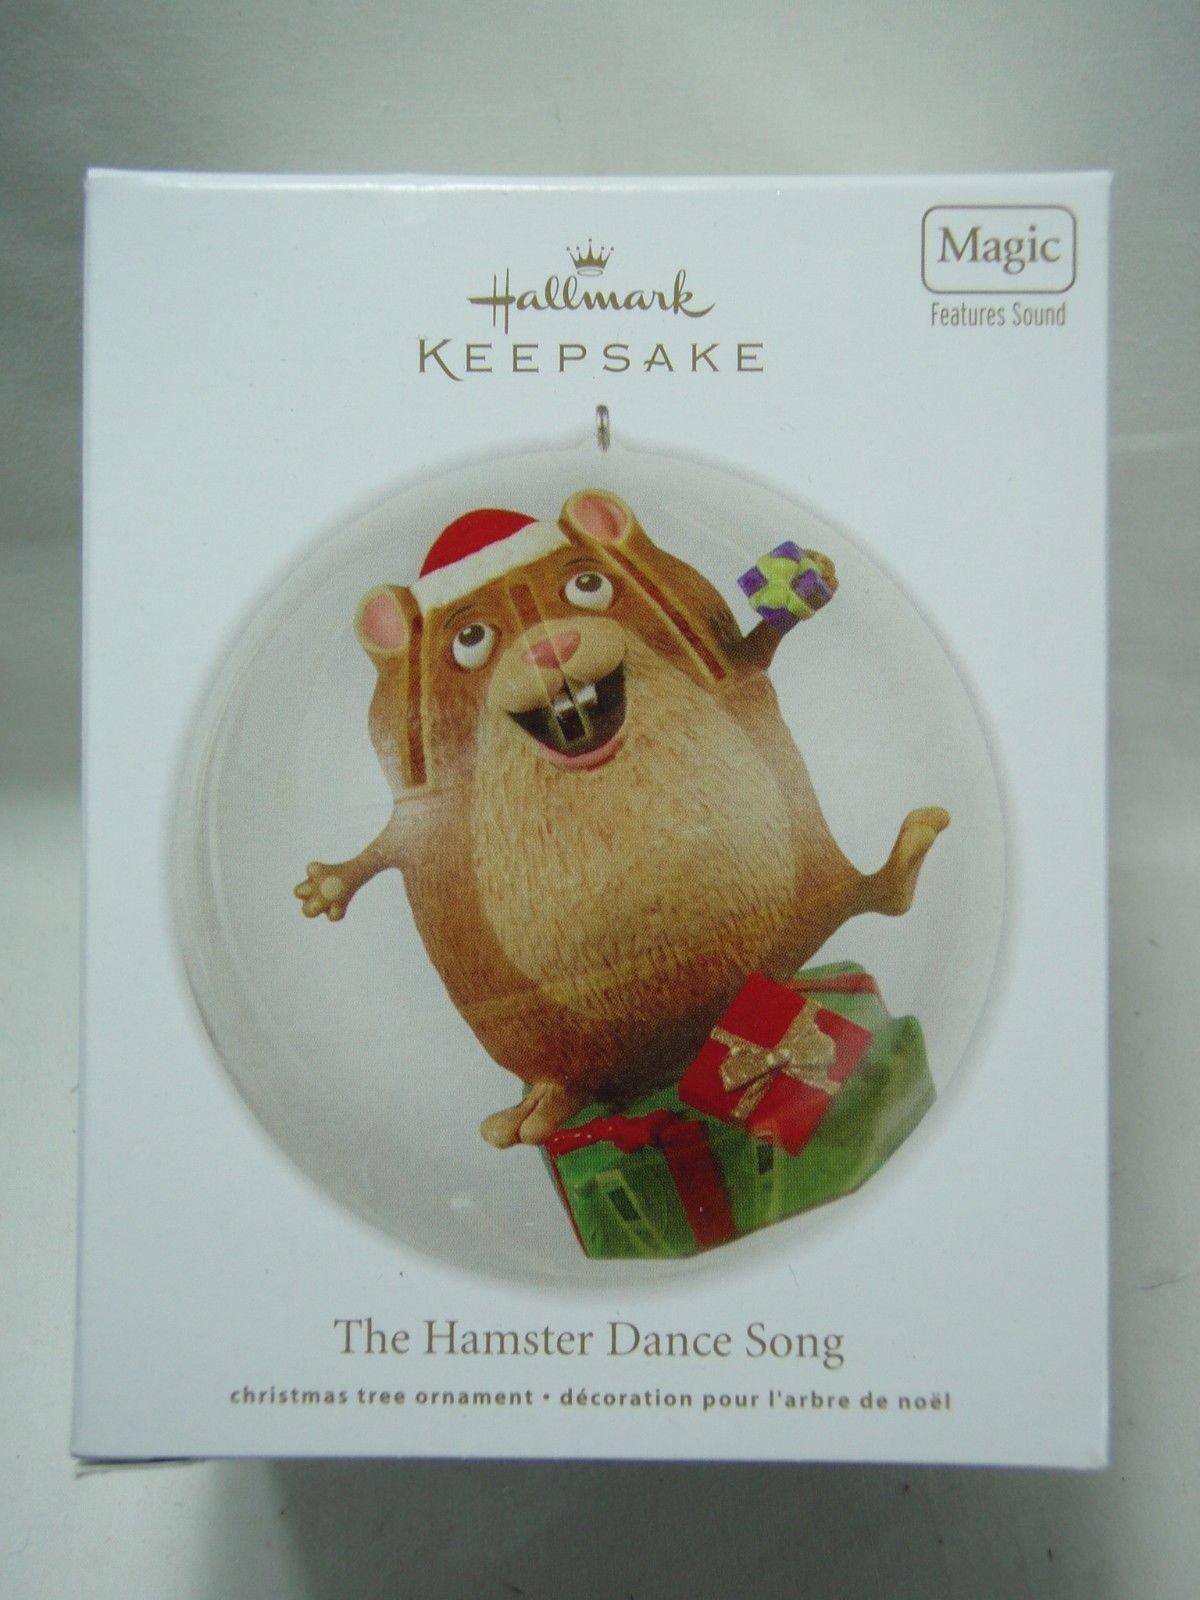 12.95 2012 Hallmark Keepsake Ornament The Hamster Dance